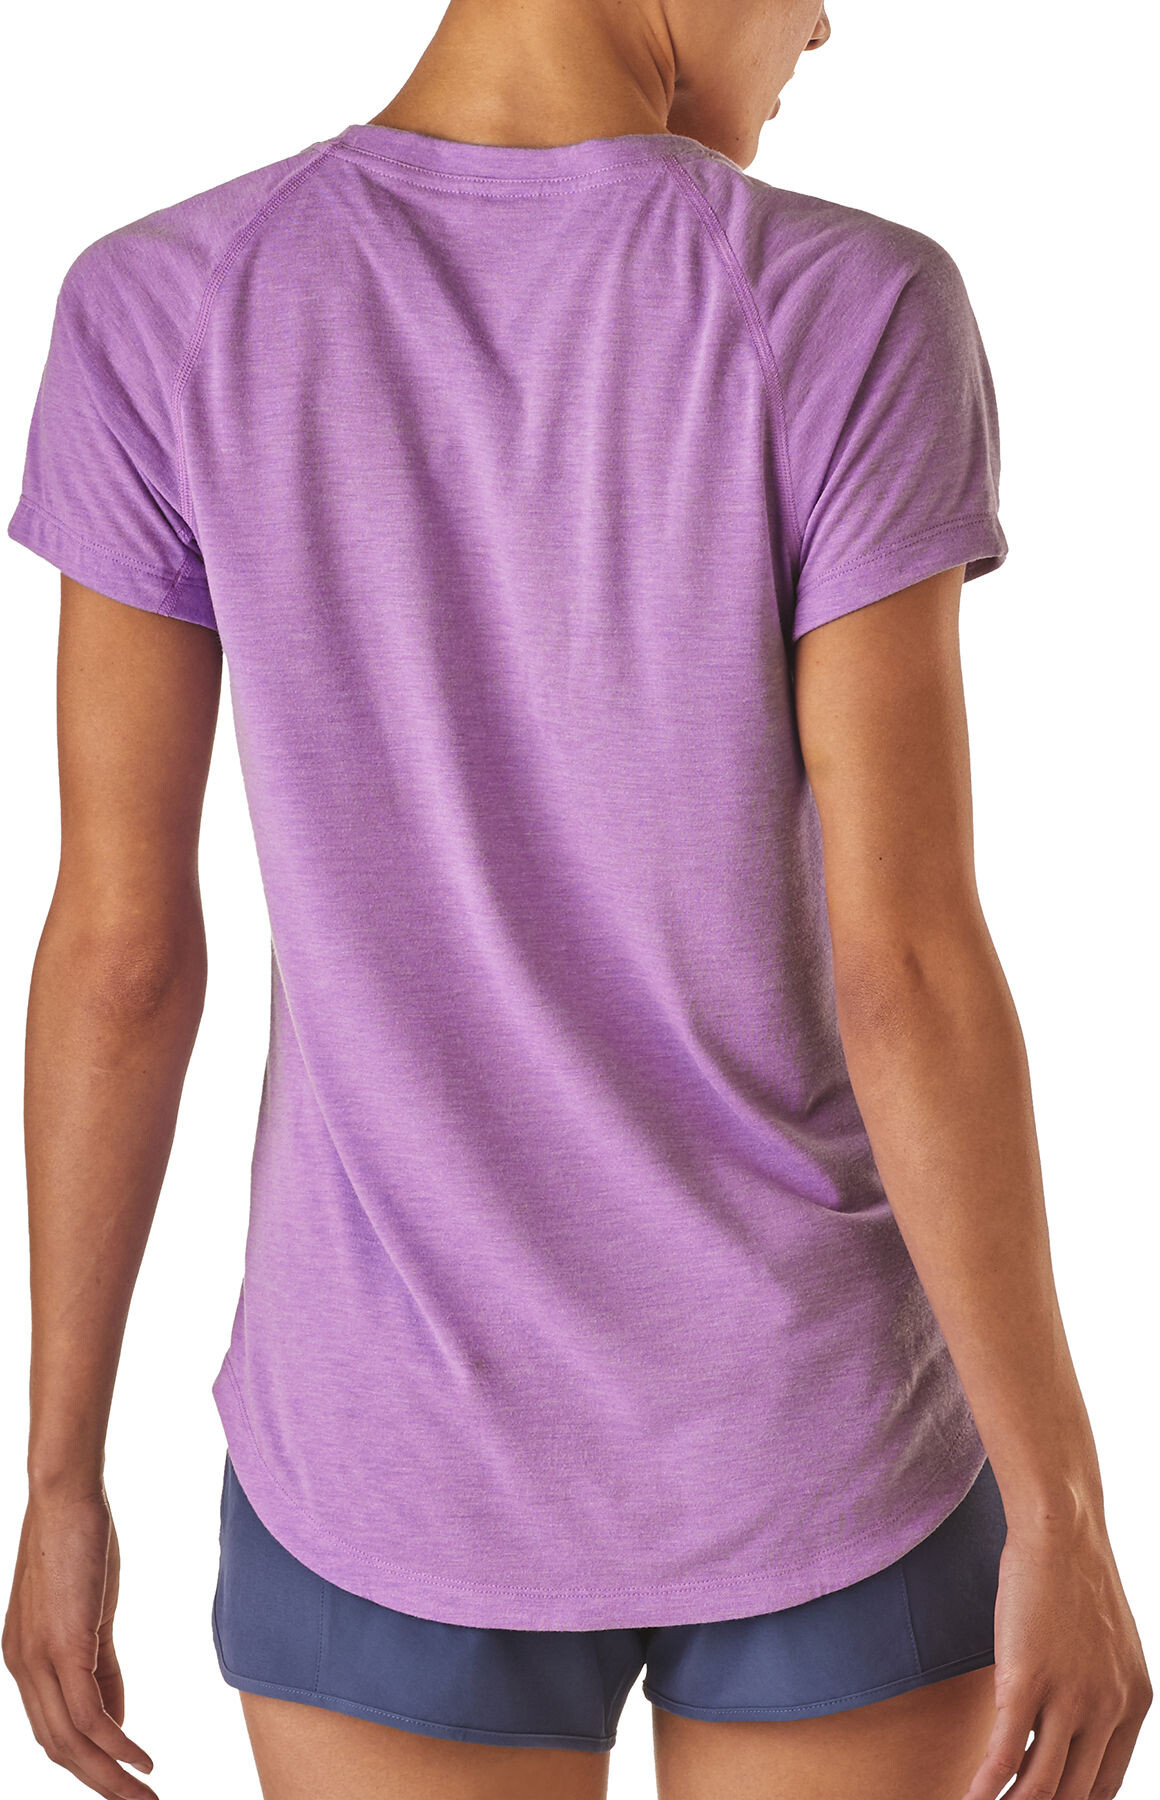 Mujer Manga Nine Violeta Trails Patagonia Camiseta Corta Onw0Pk